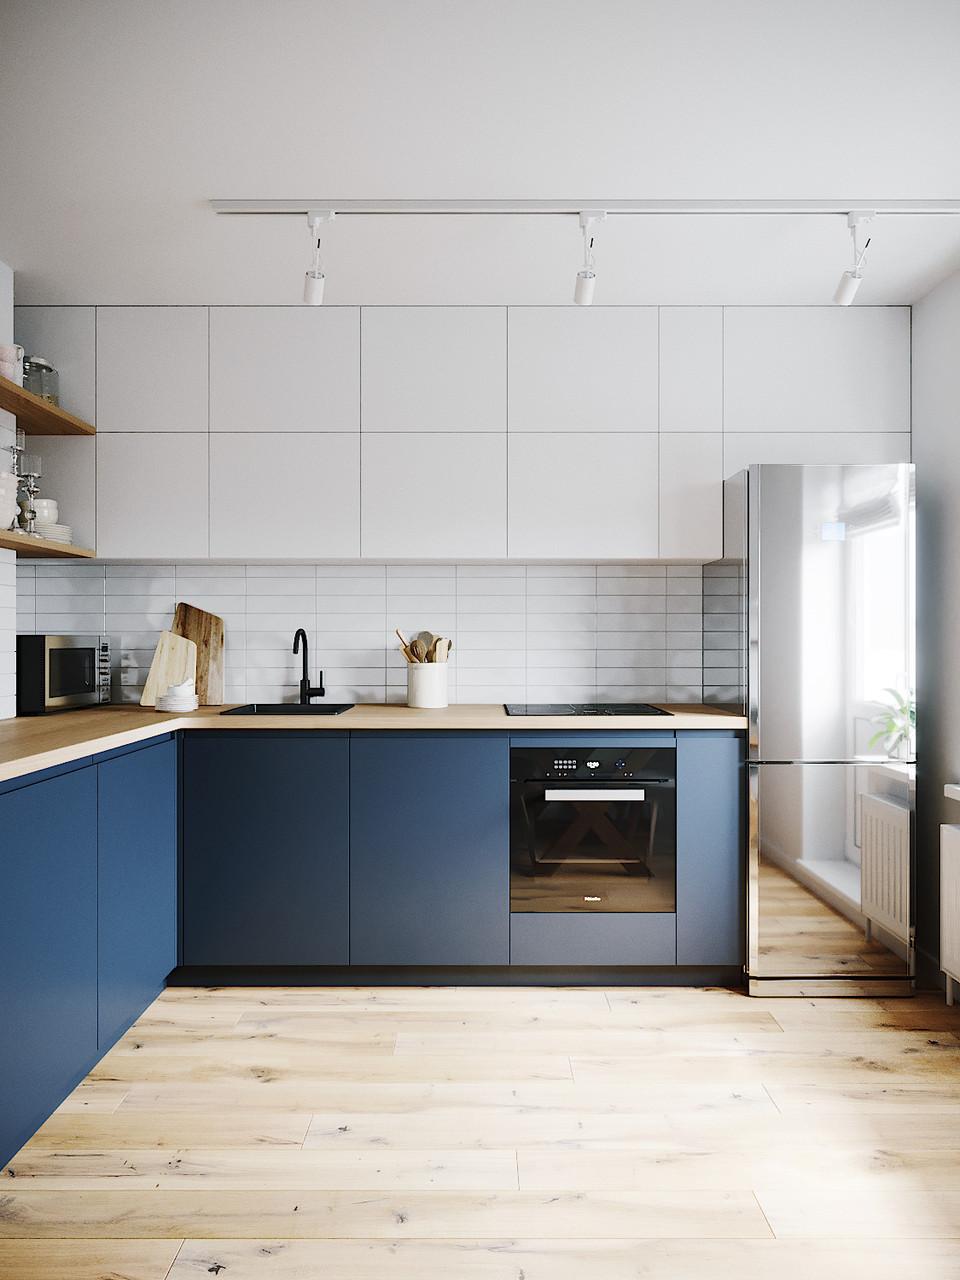 Кухня на заказ синие фасады краска мат низ, верх белые.